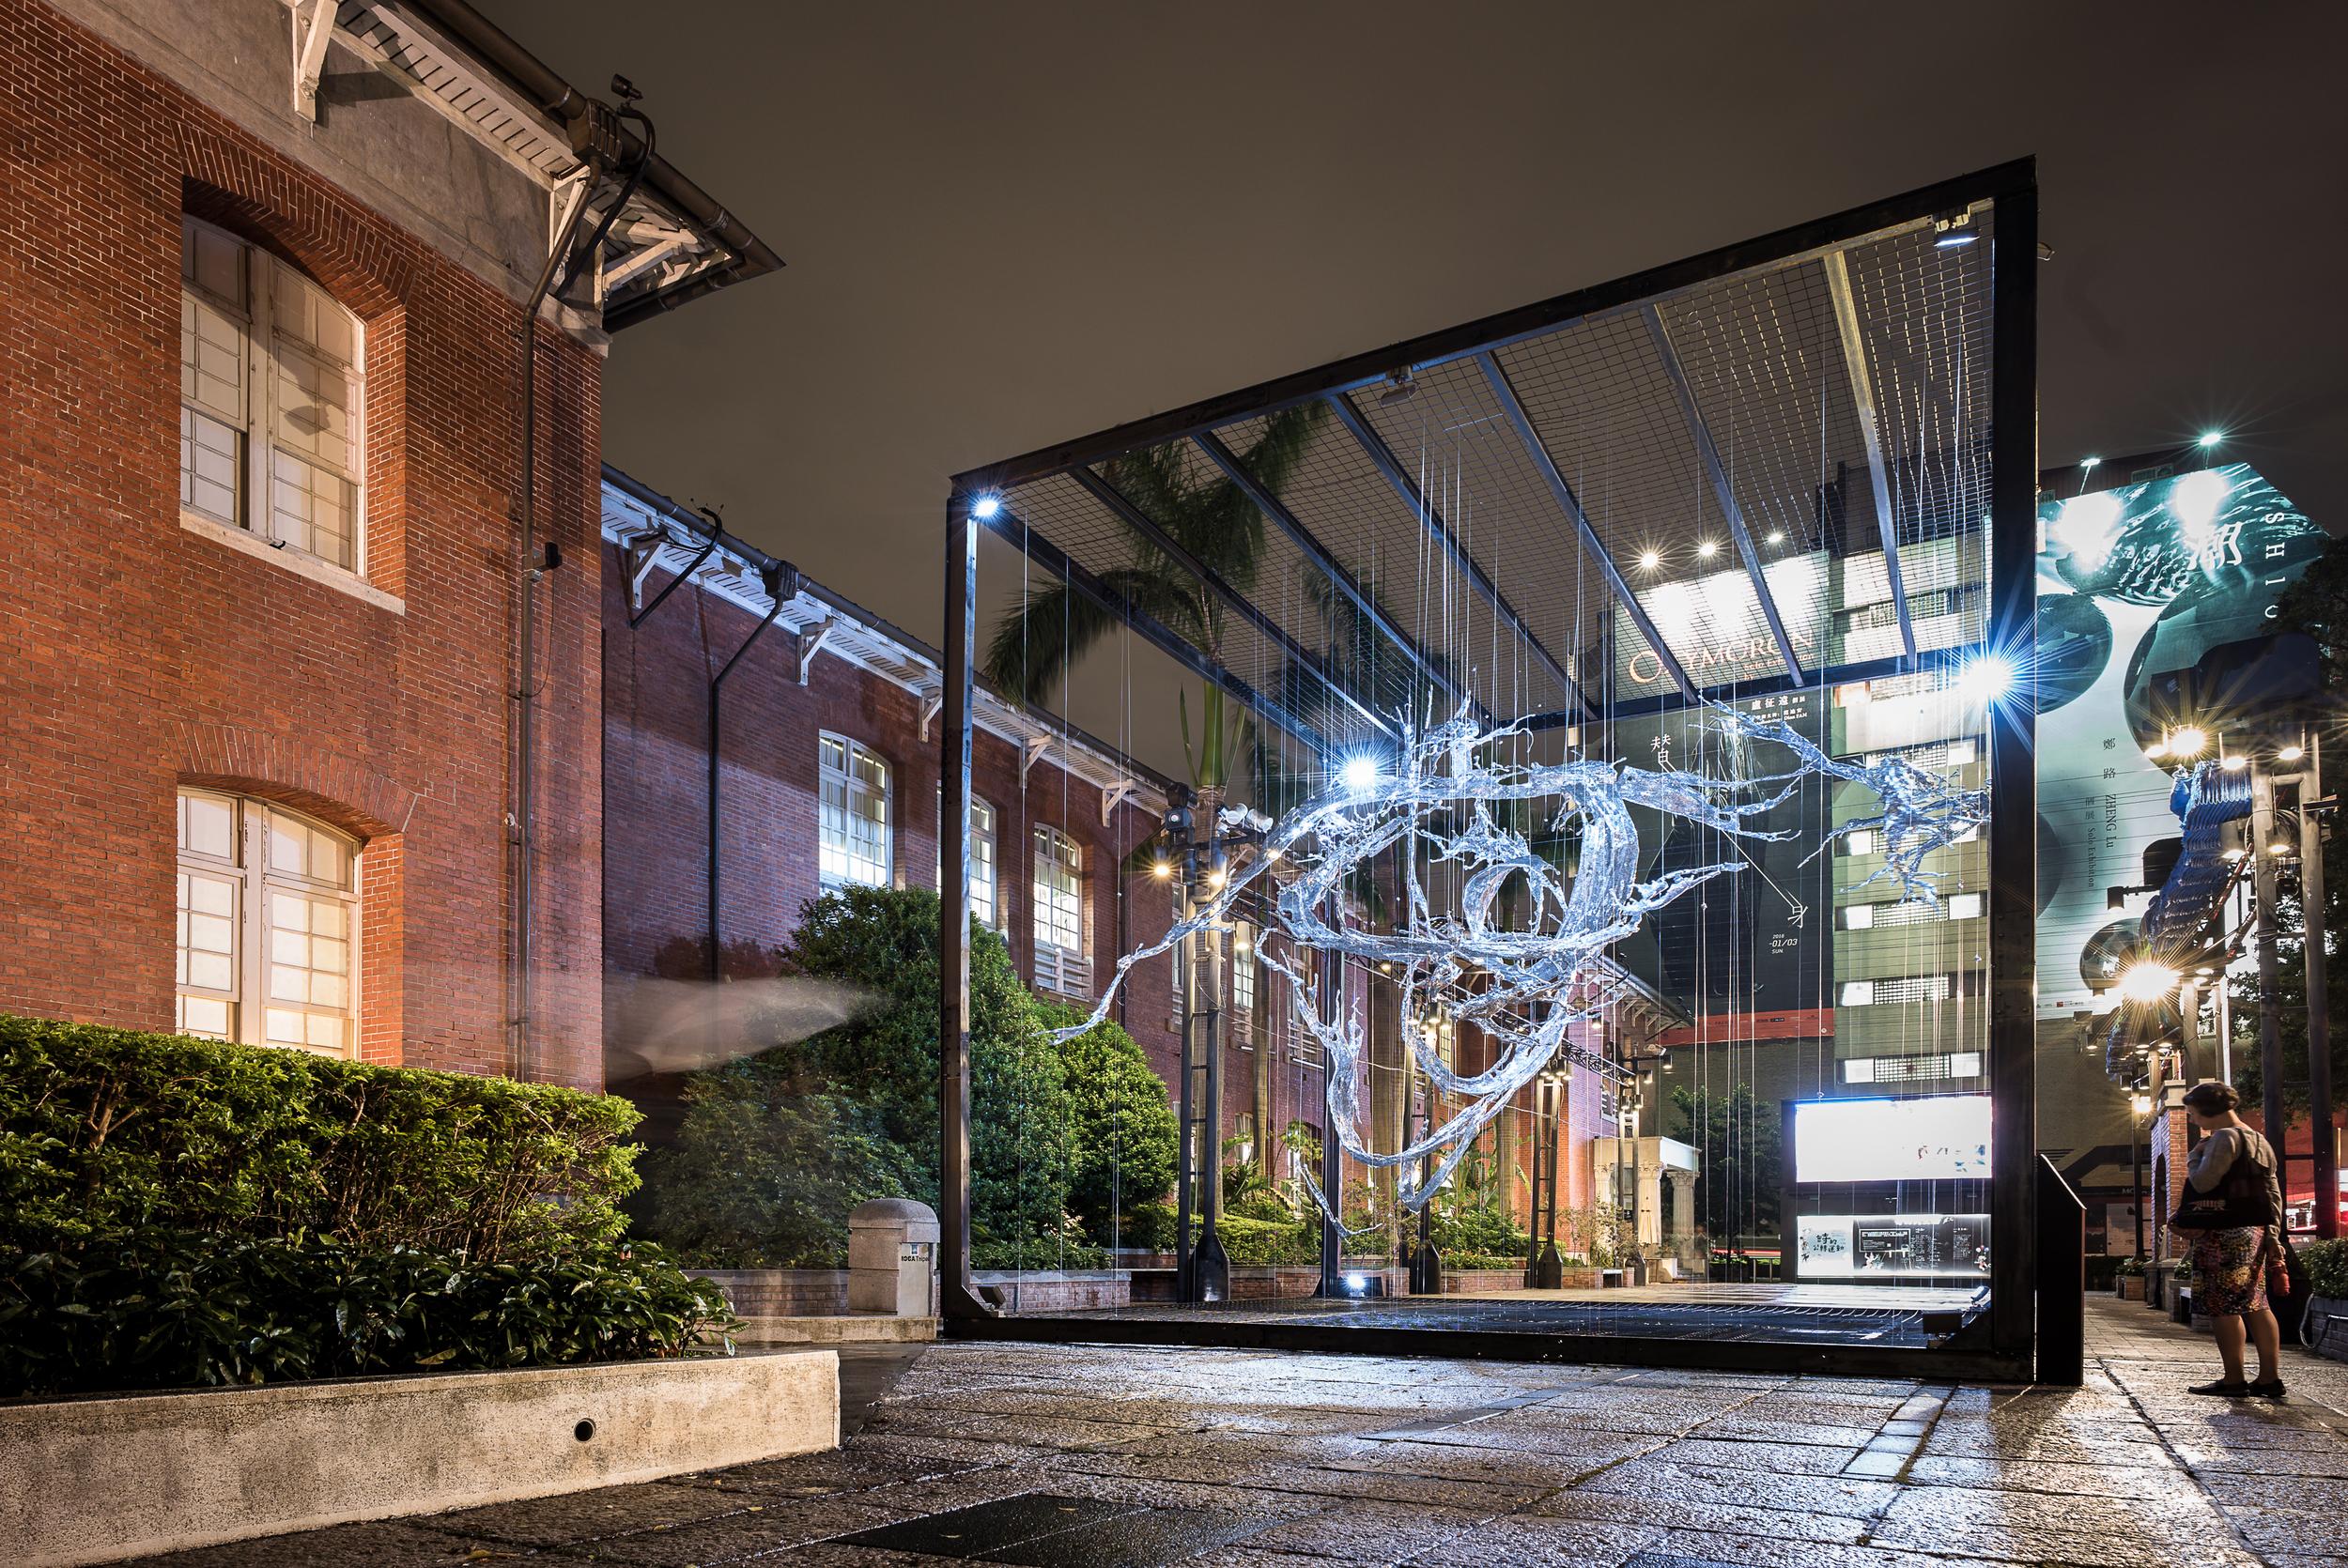 Zheng Lu 郑路, Water in Dripping - Billows 淋漓-澜, 2015, Stainless steel 不锈钢, 700 x 700 x 700 cm